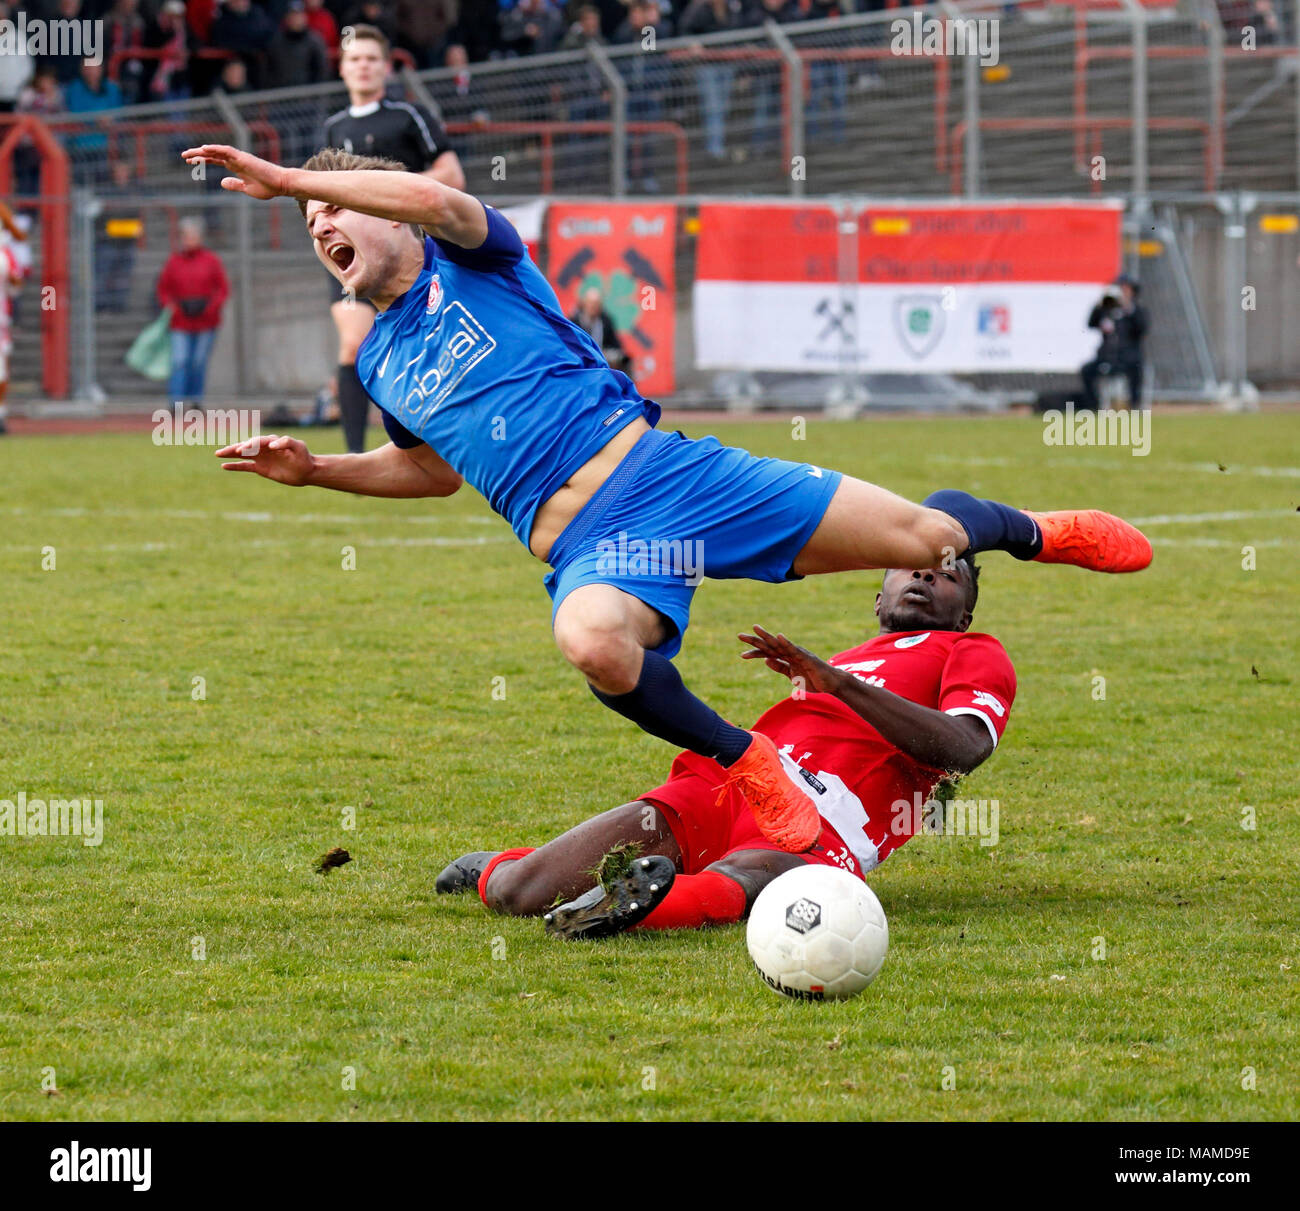 sports, football, Regional League West, 2017/2018, Rot Weiss Oberhausen vs Wuppertaler SV 1:1, Stadium Niederrhein in Oberhausen, scene of the match, Daniel Heber (RWO) right and Enzo Wirtz (WSV) - Stock Image